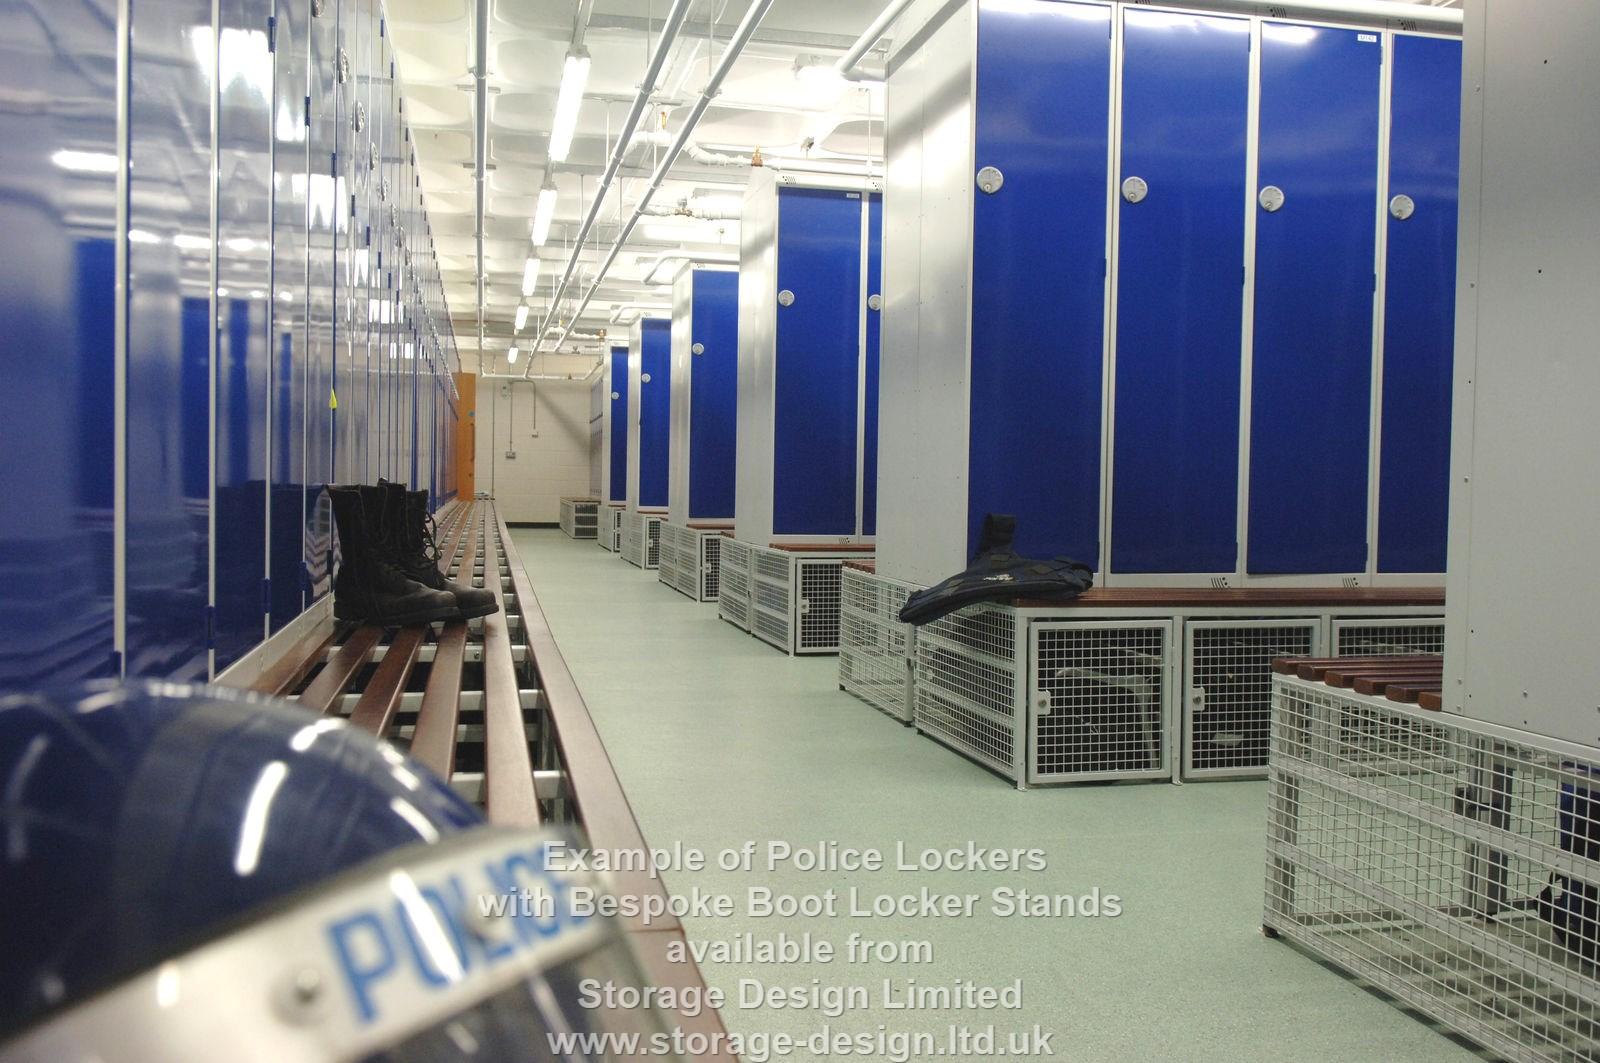 Police Lockers